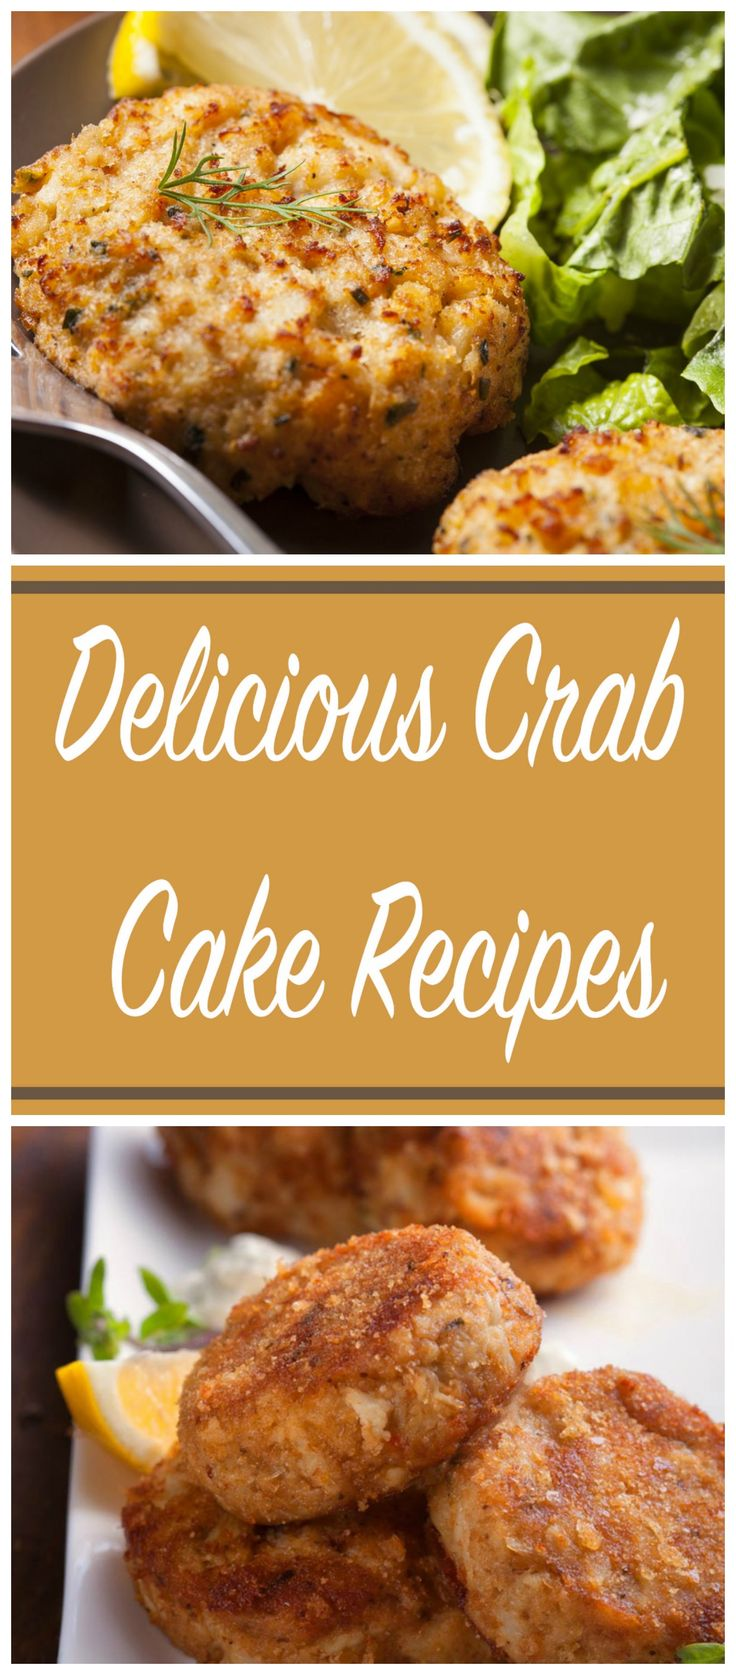 Delicious crab cake recipes crab cake recipes crab